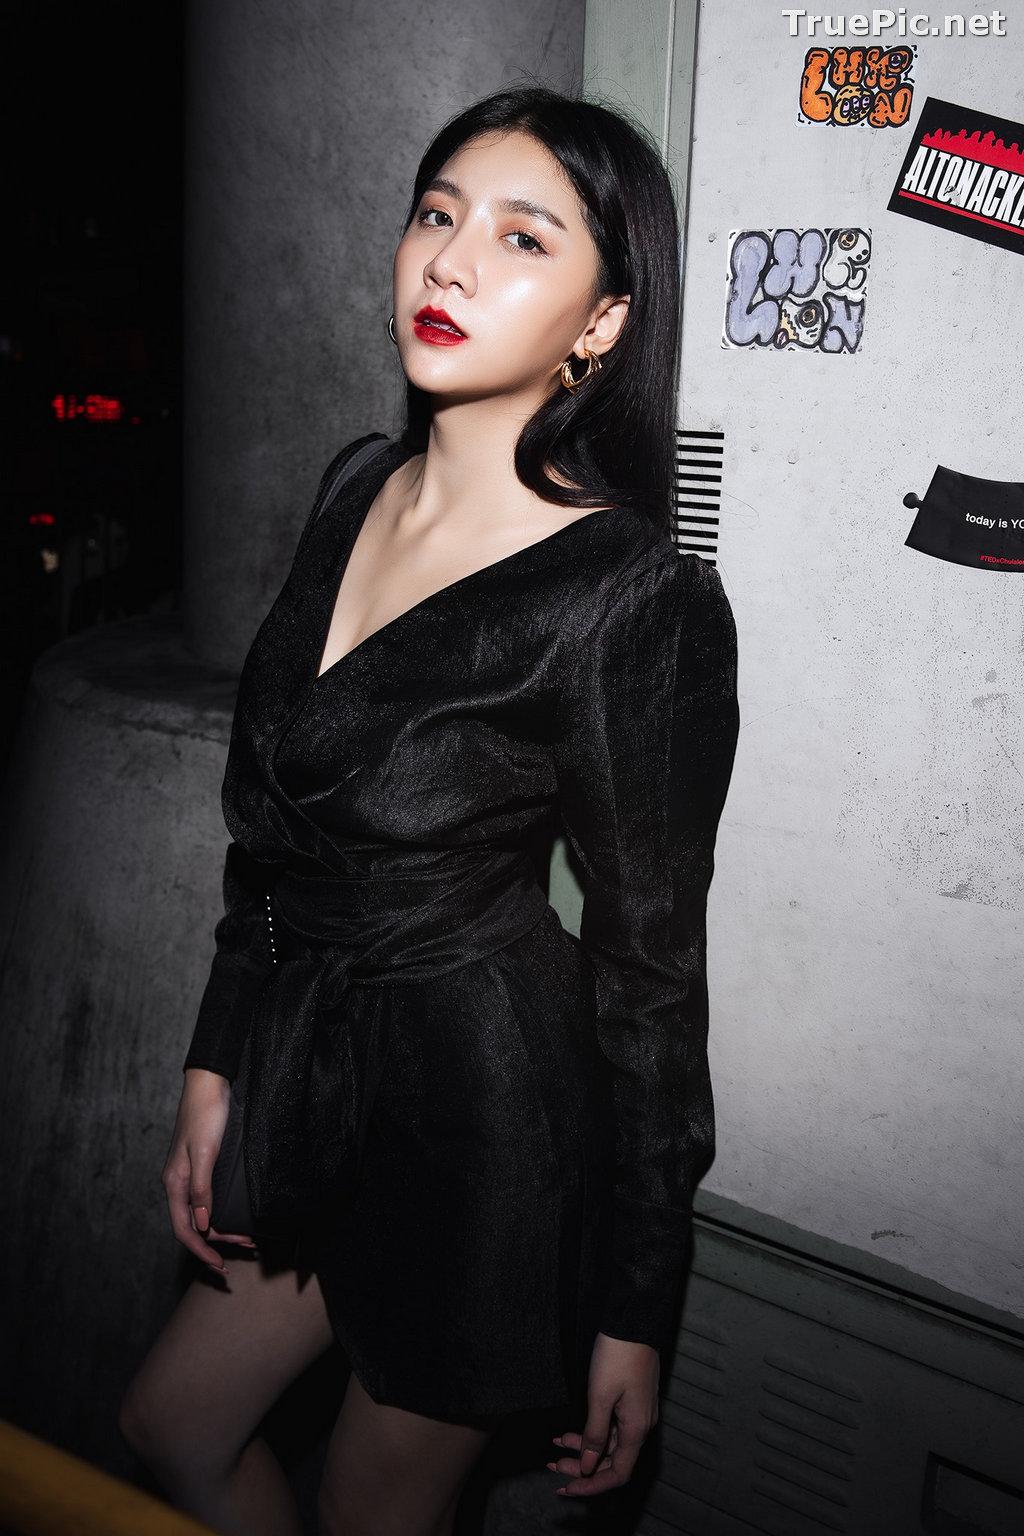 Image Thailand Model - Sasi Ngiunwan - Black For SiamNight - TruePic.net - Picture-16